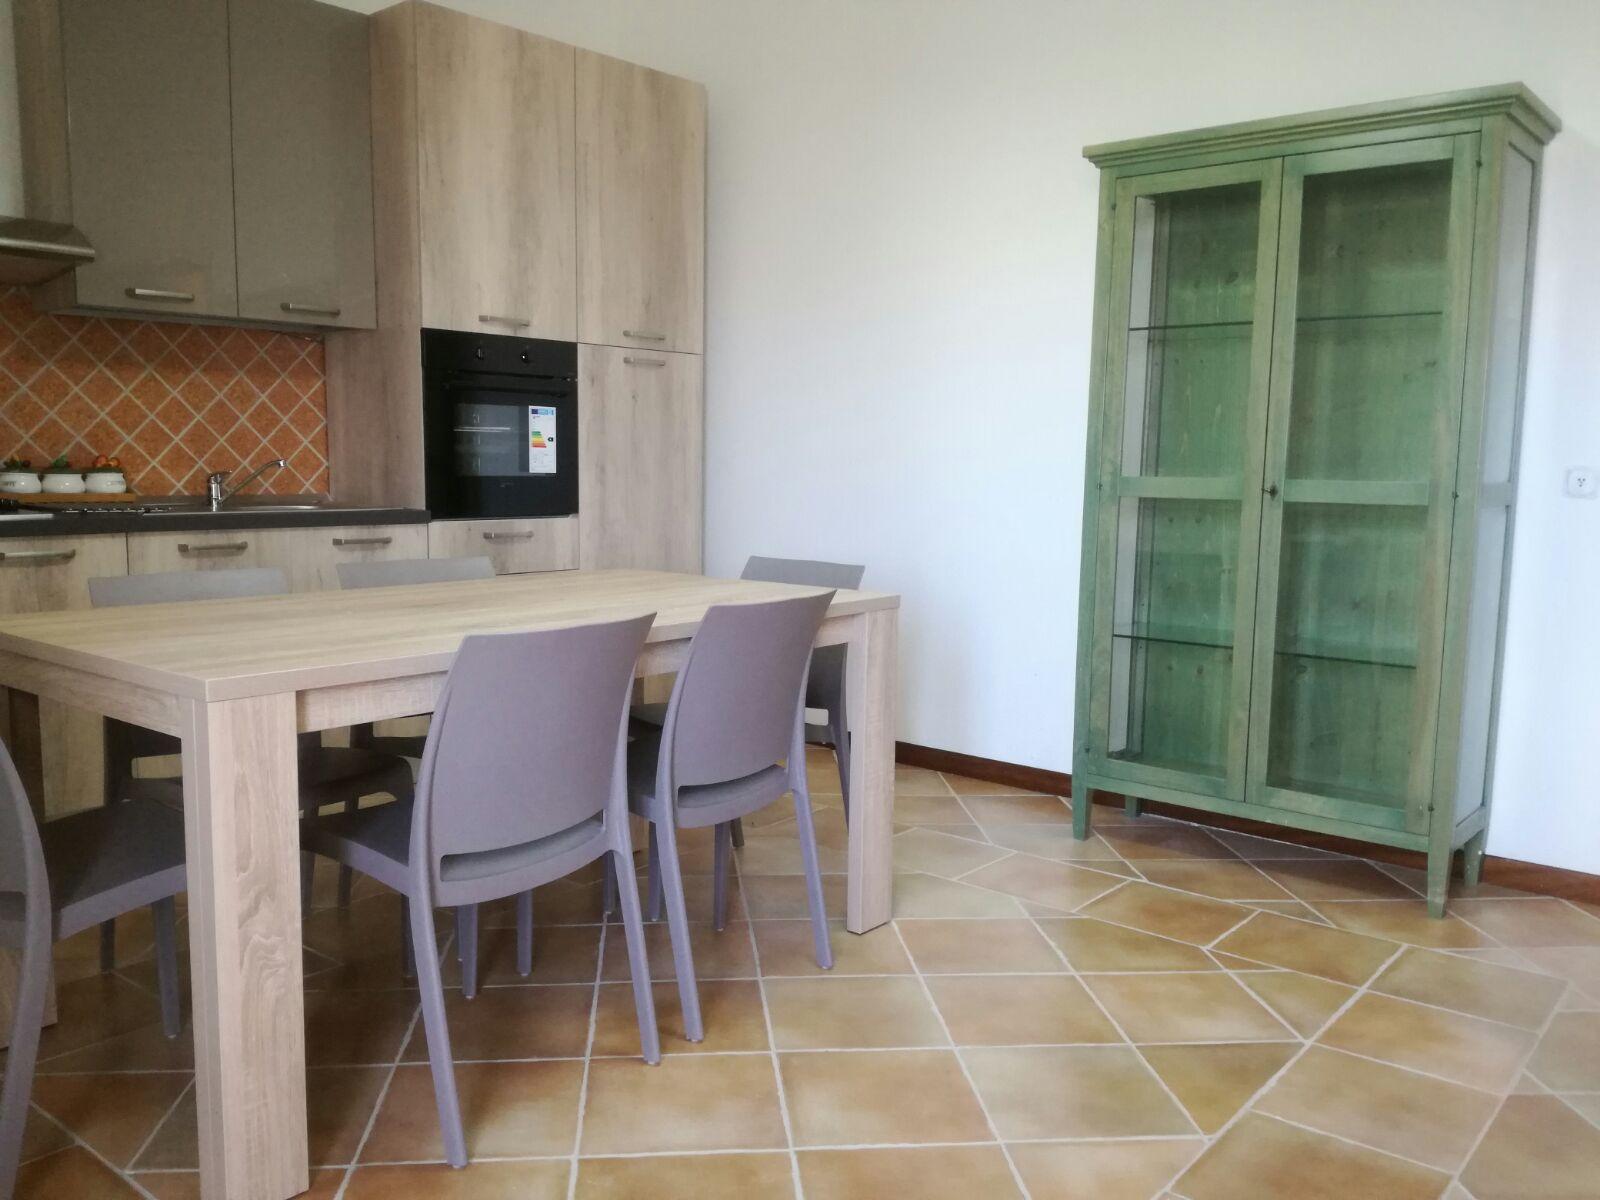 Appartamento, 120 Mq, Vendita - Agrigento (Agrigento)